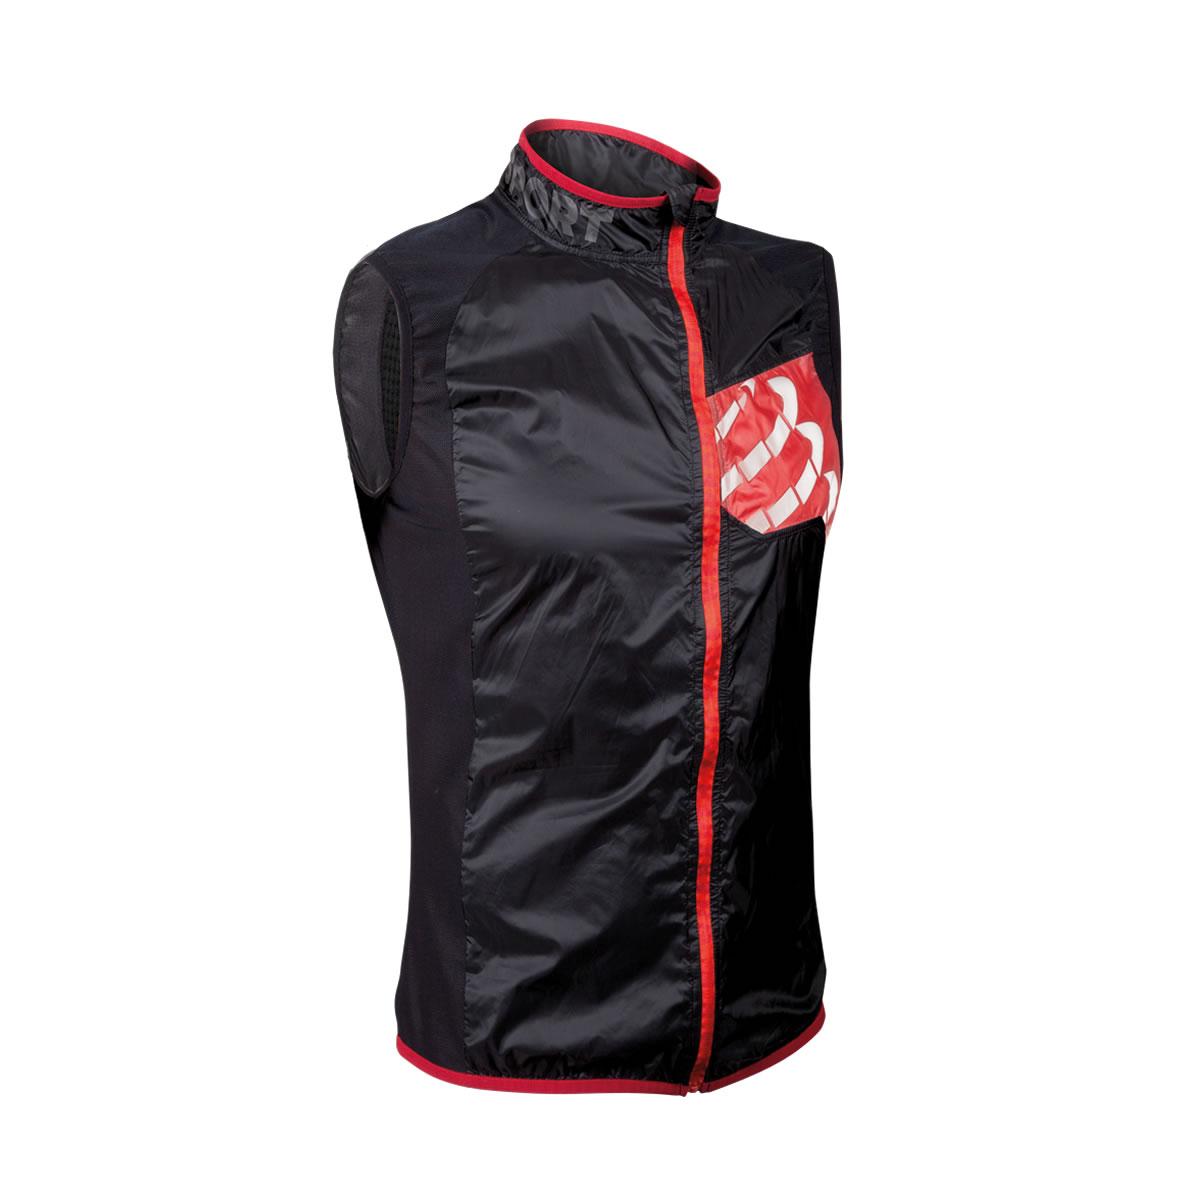 Compressport Hurricane Trail Running Vest - Performance Store 86da01869c8